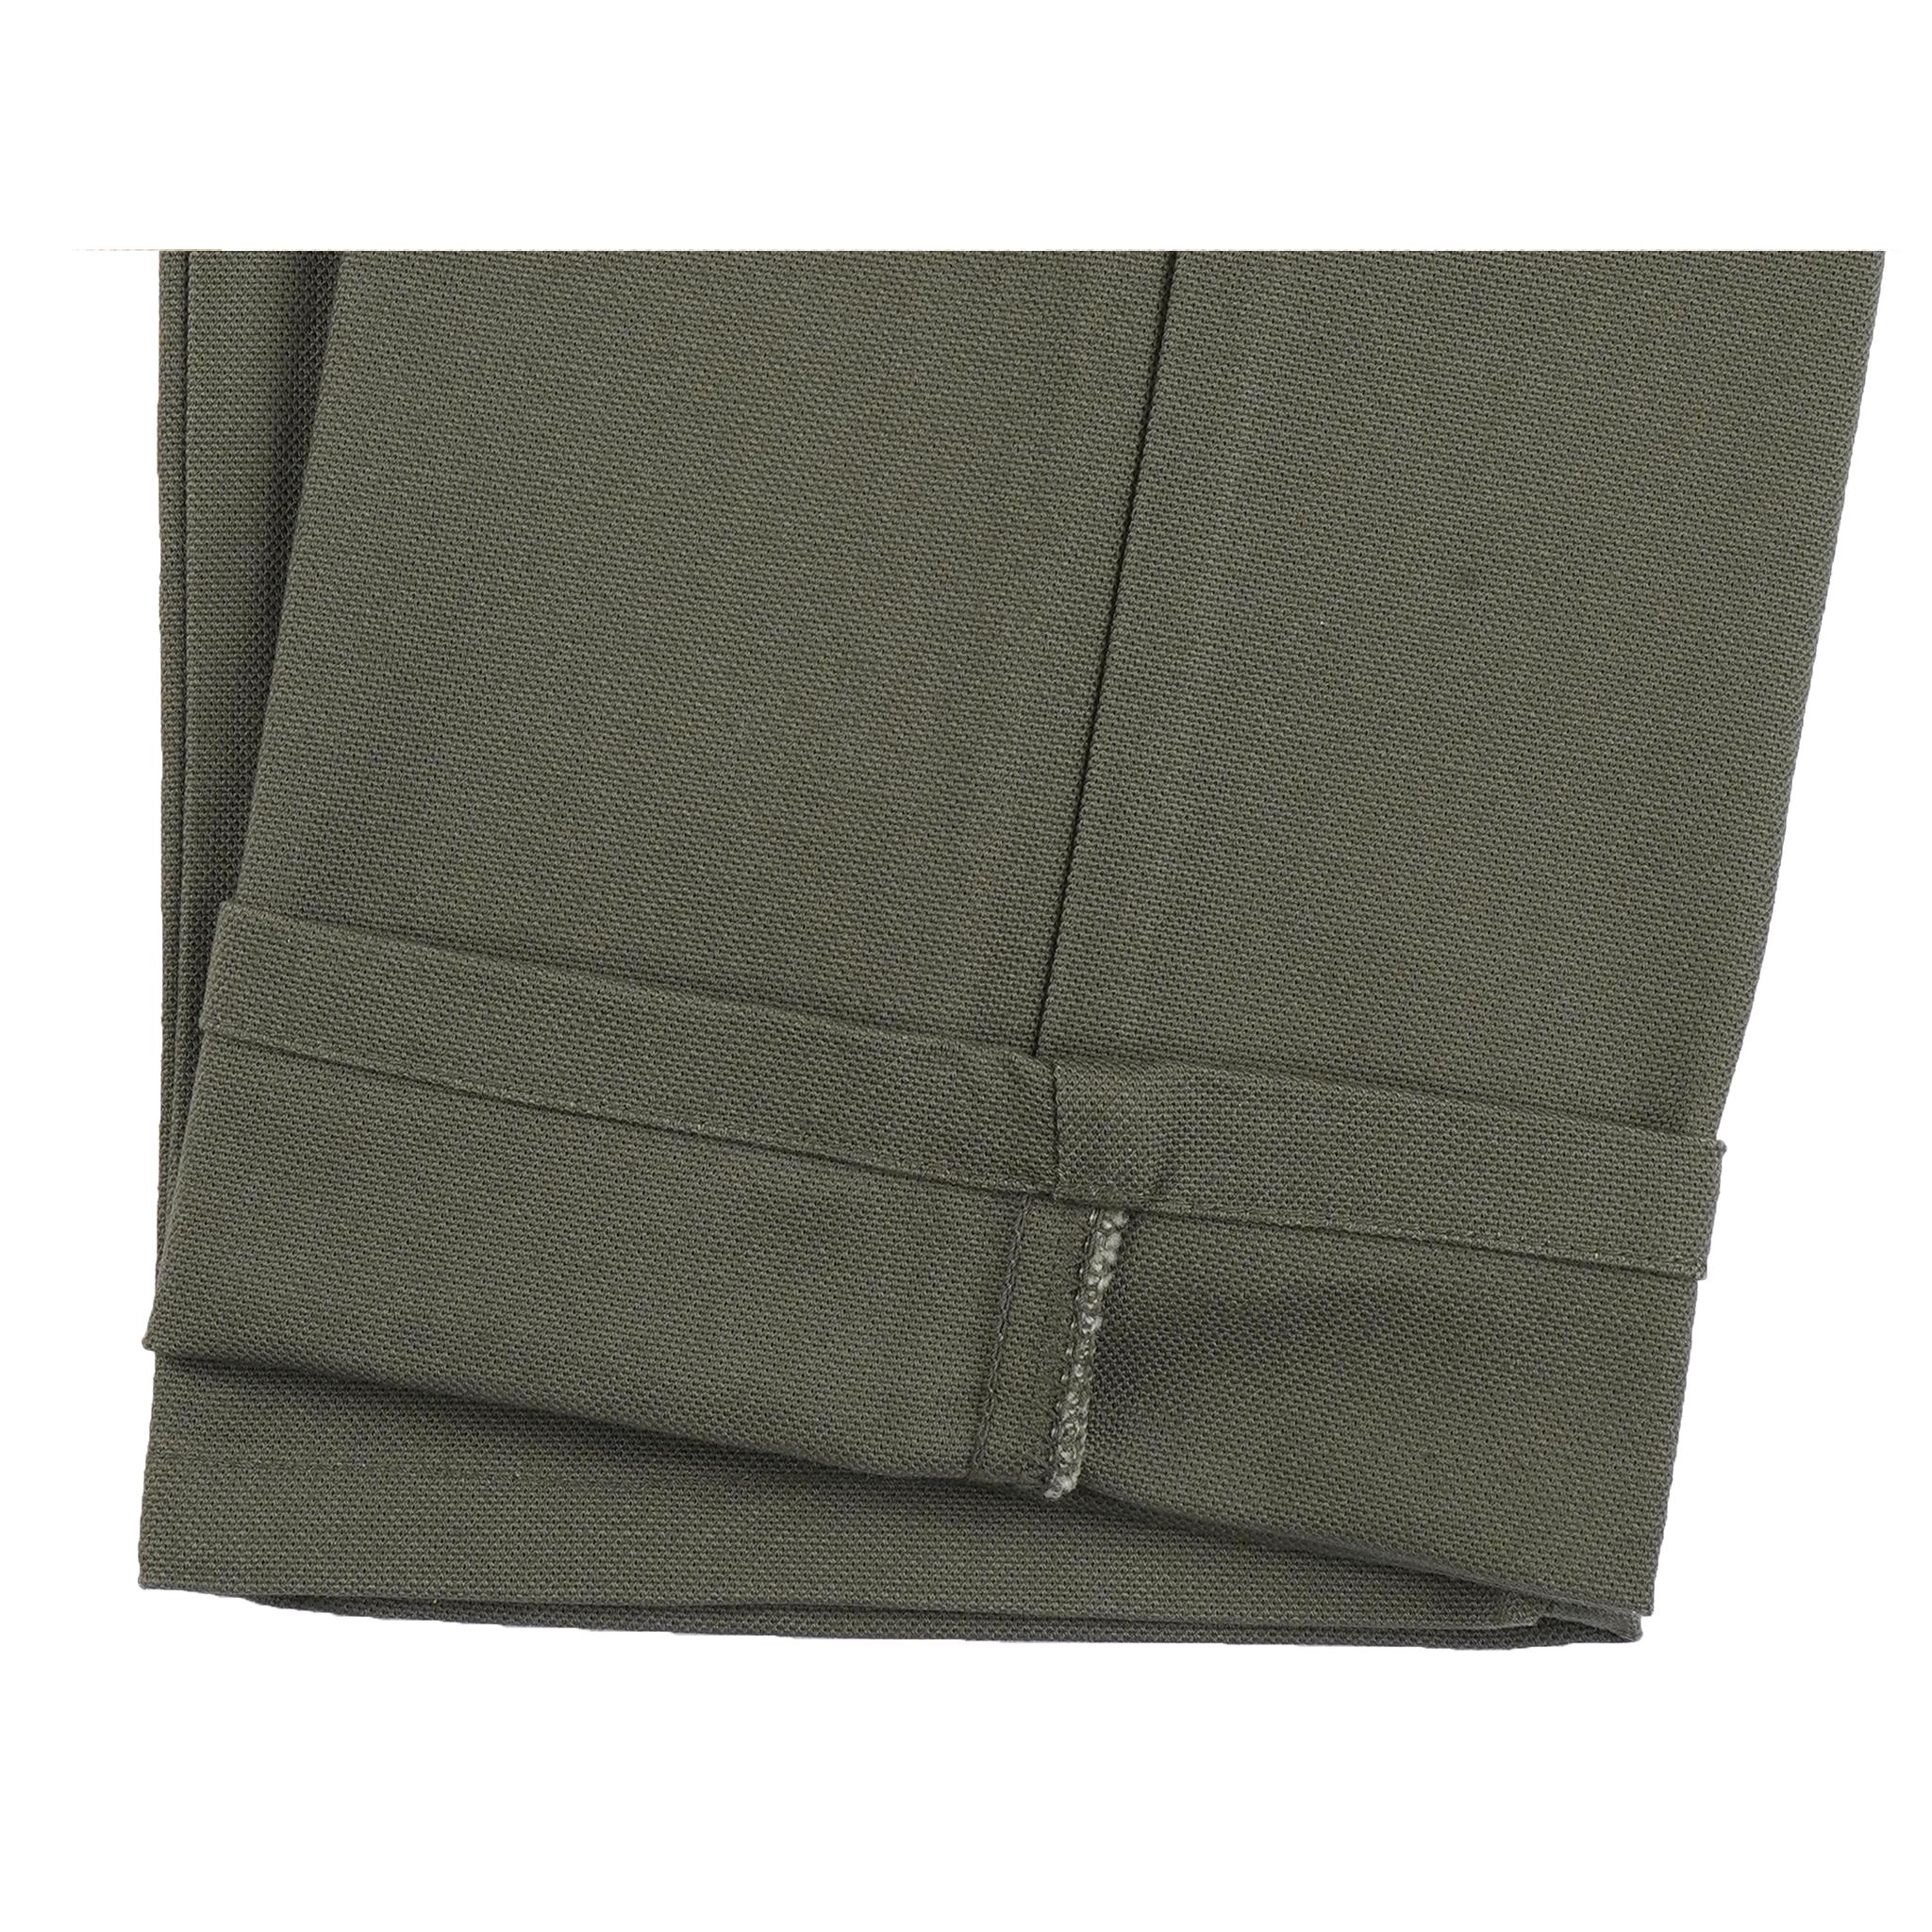 Women's Fatigue Pant Green Canvas - hem